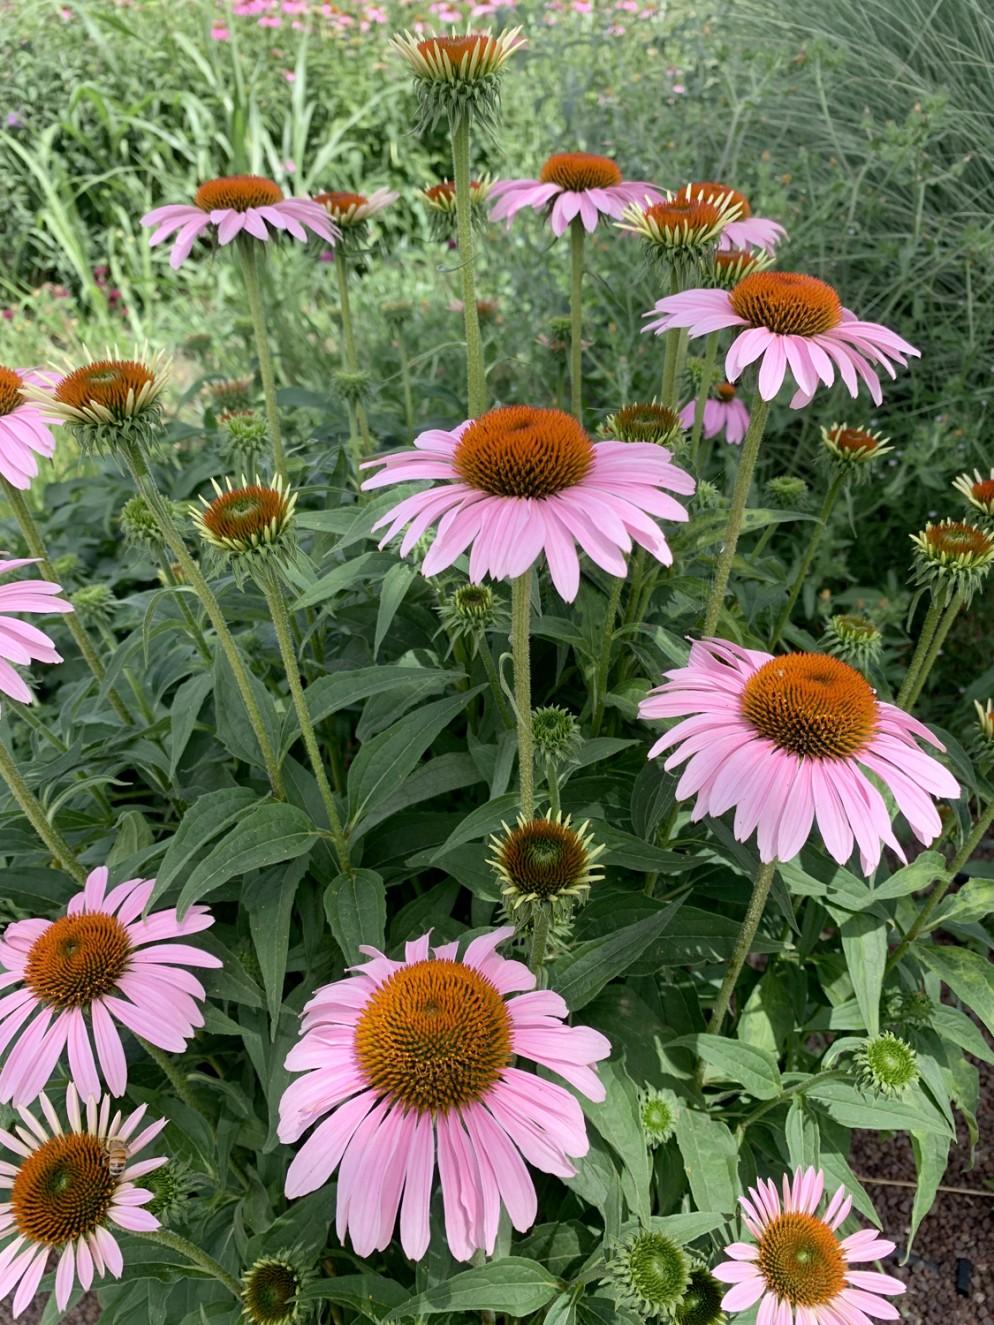 piante-sempreverdi-da-giardino-11. Echinacea pianta erbacea perenneliving-corriere